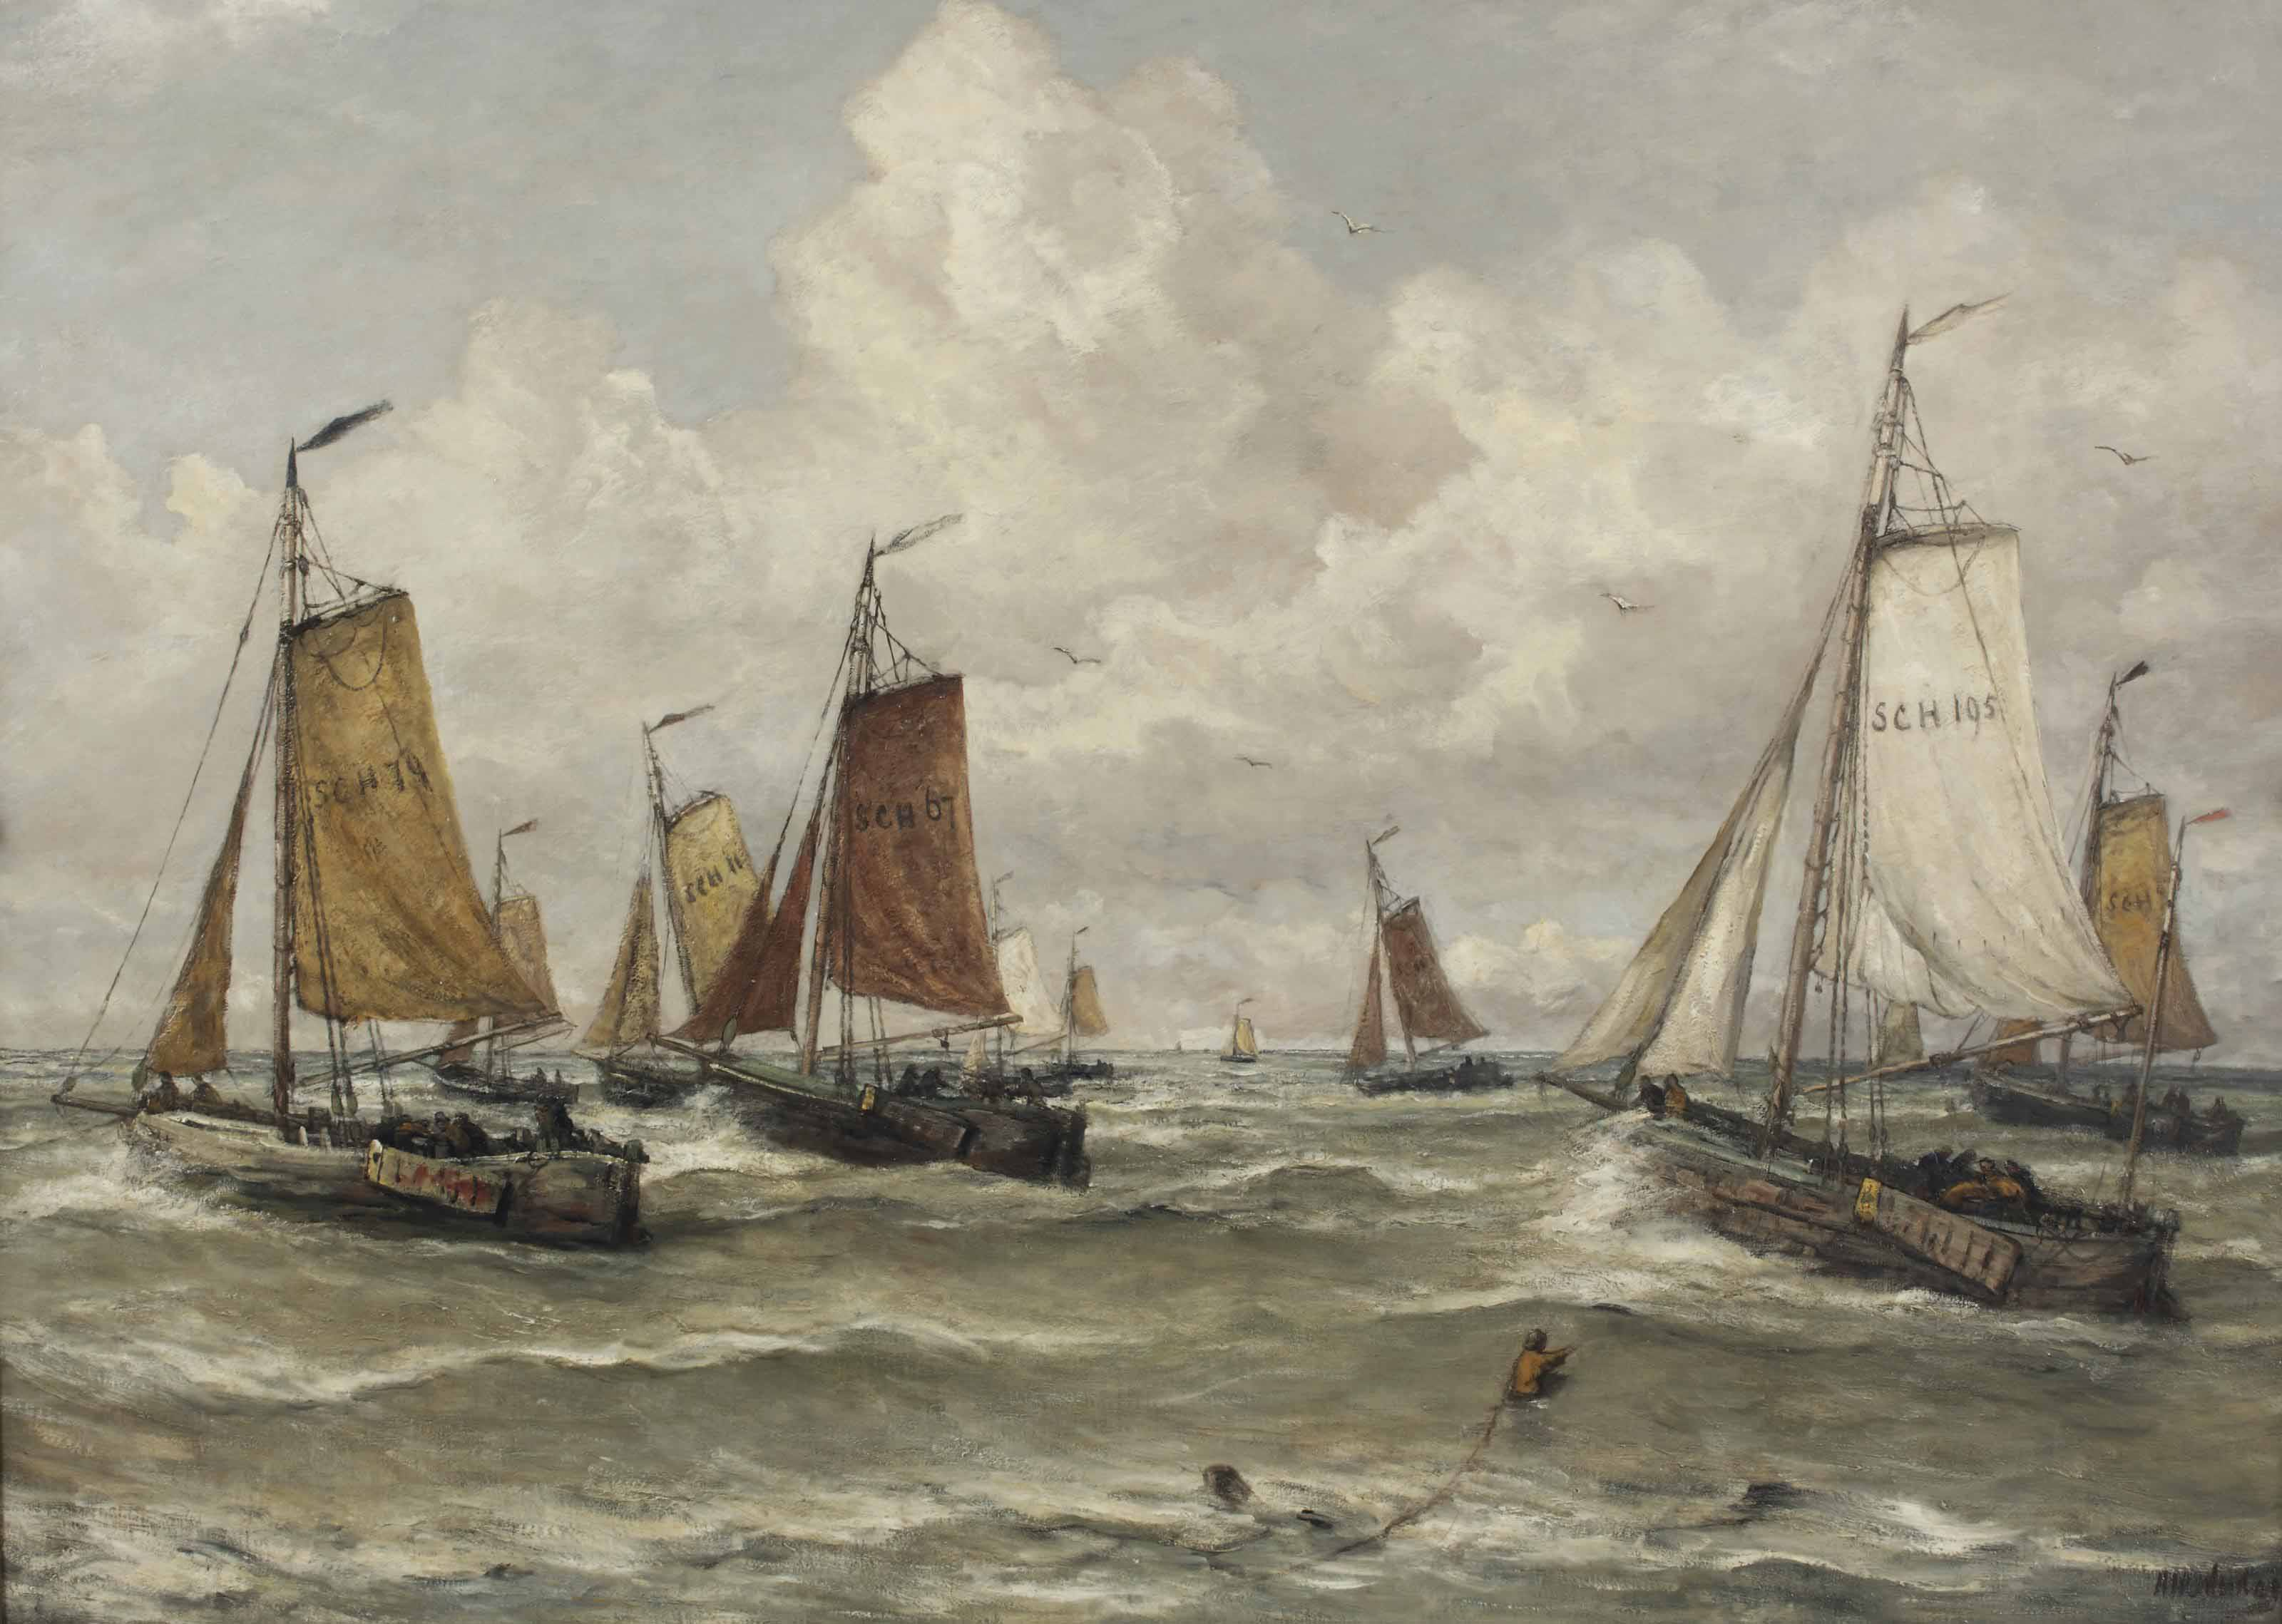 Vissersvloot te Scheveningen: a Scheveningen fishing-fleet